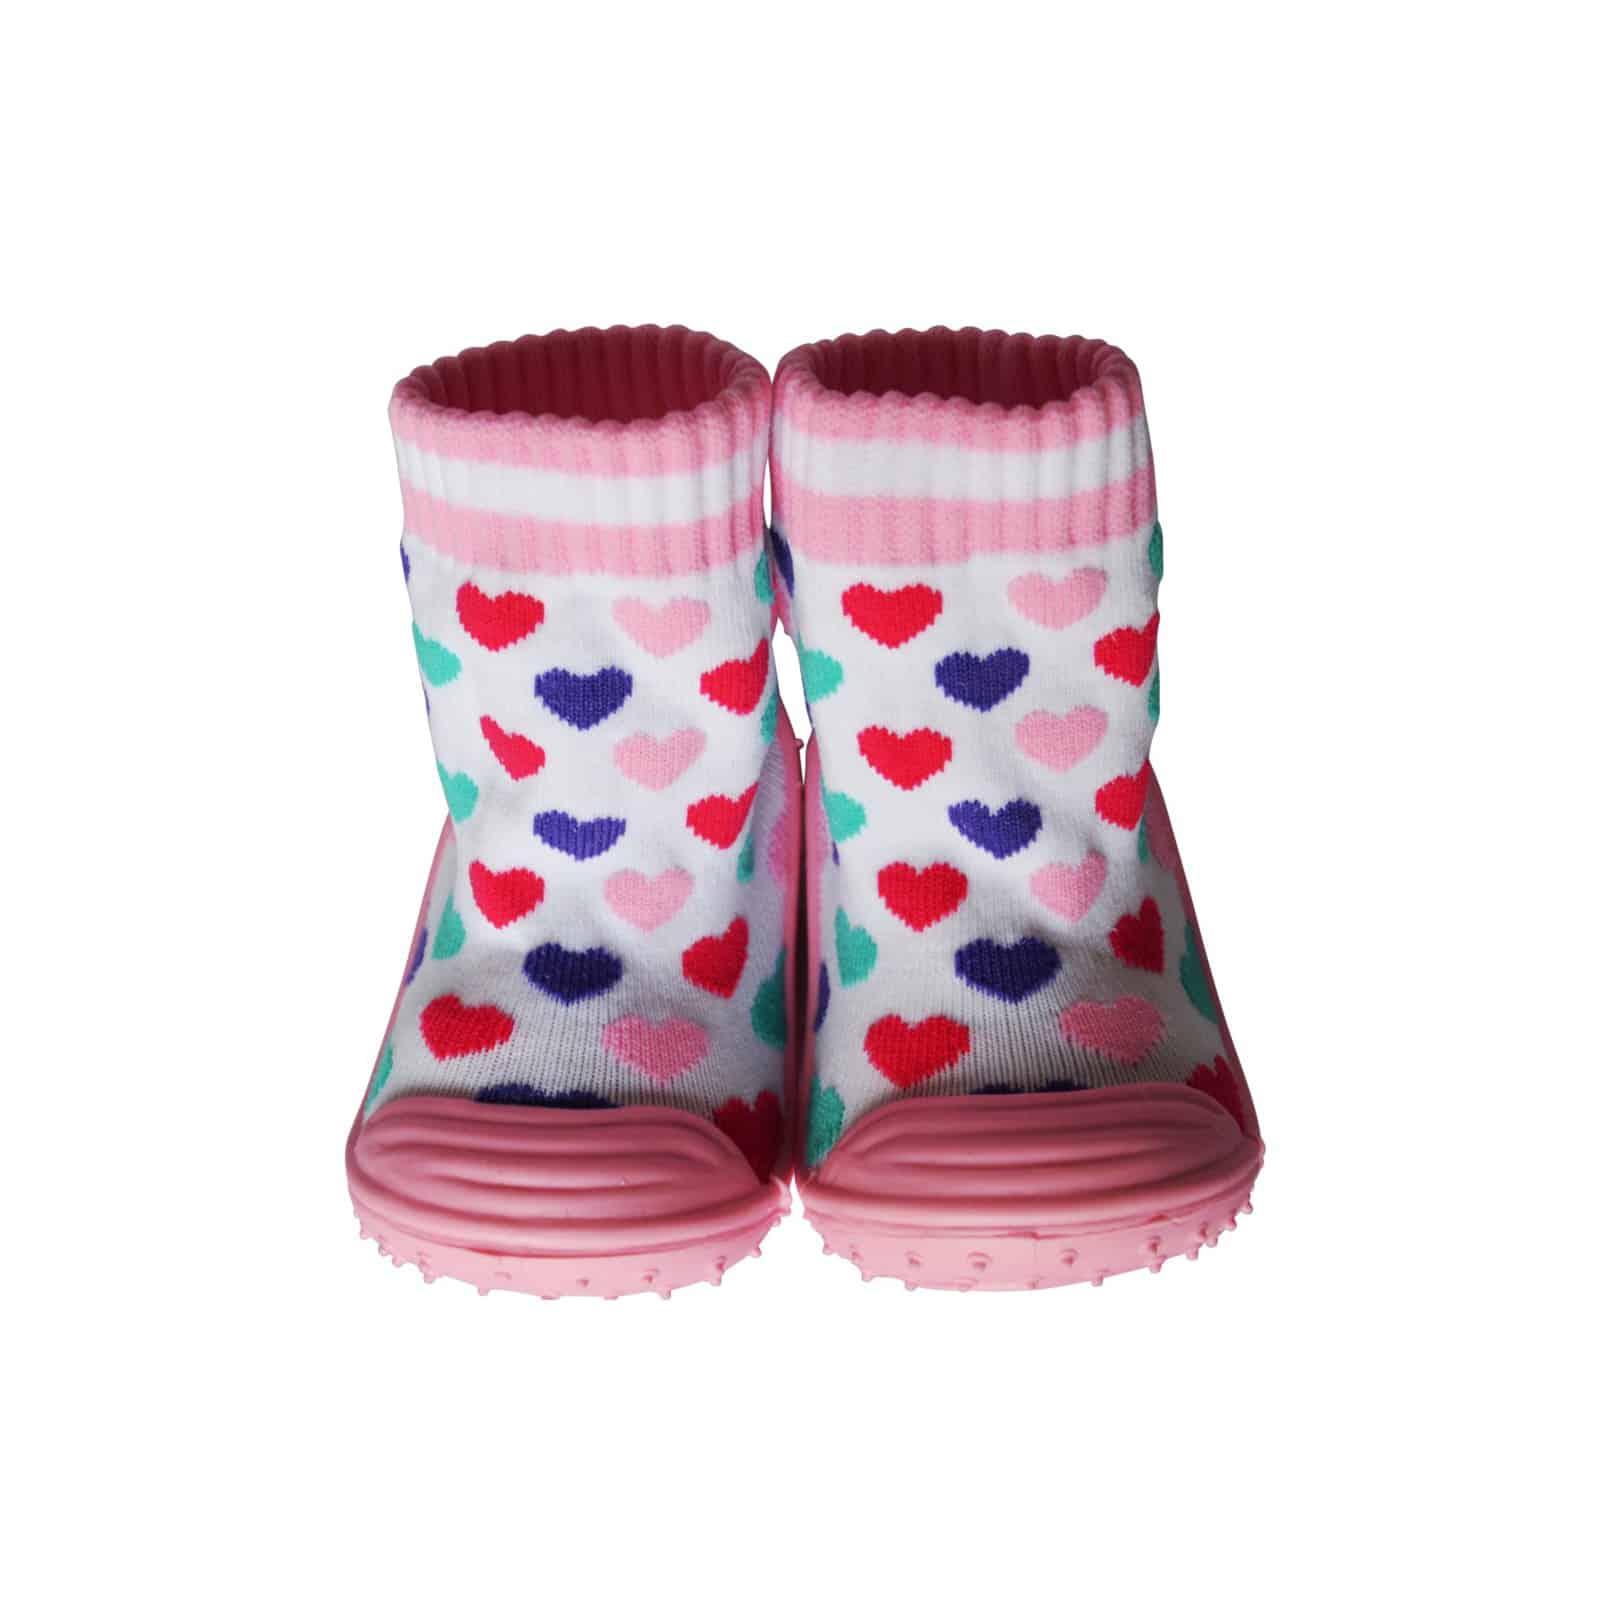 e319af78fdd0e Chaussons-chaussettes antidérapants COEURS